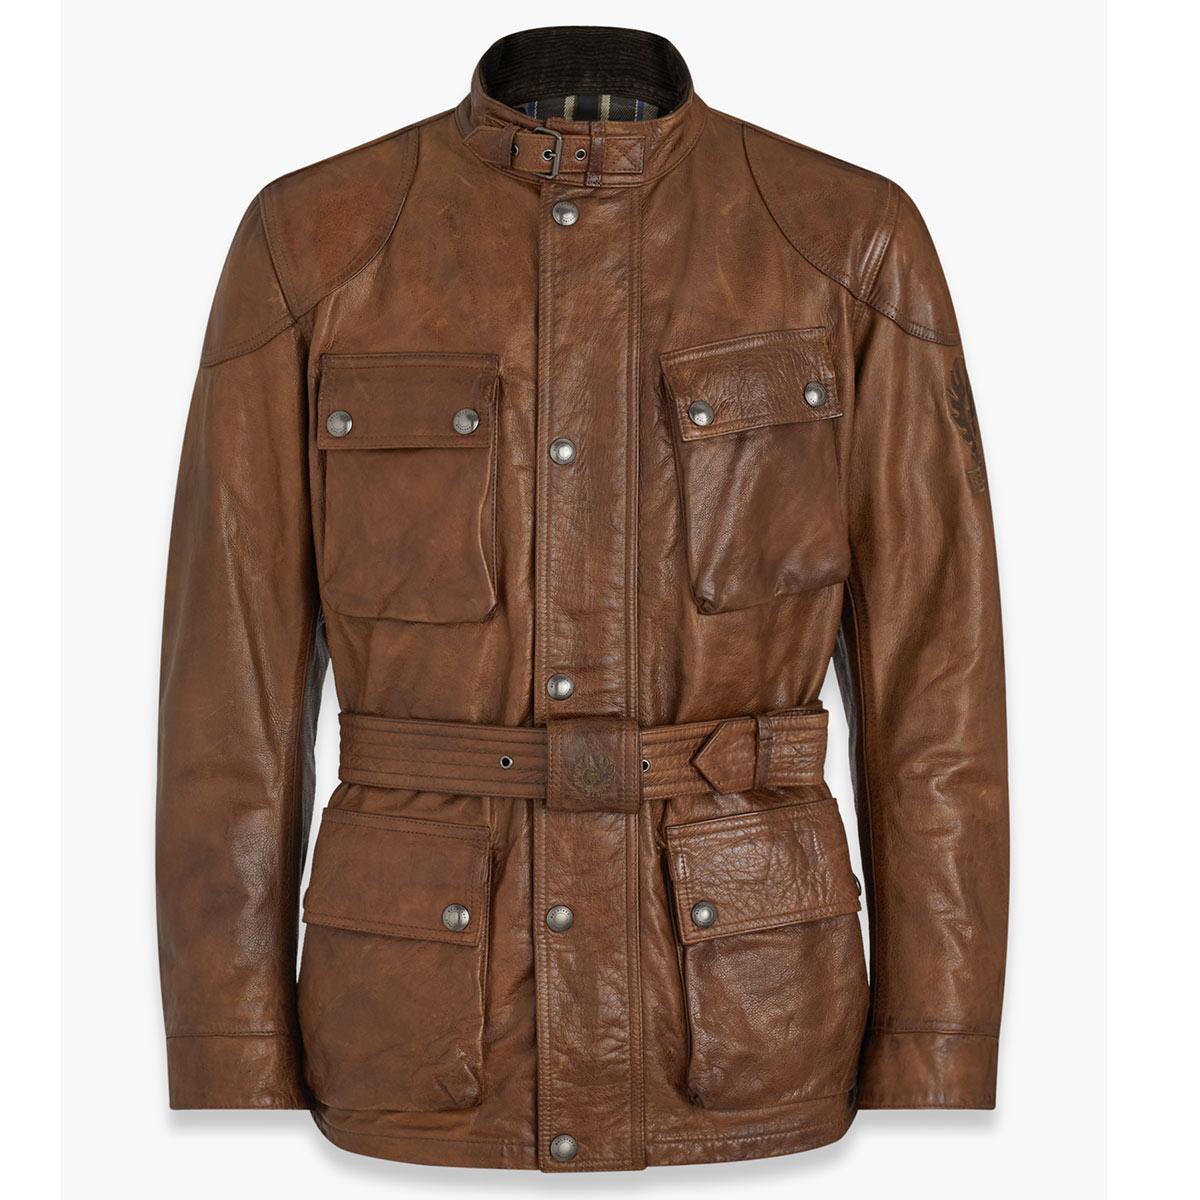 Belstaff Trialmaster Pro Hand Waxed Leather Jacket - Burnt Cuero